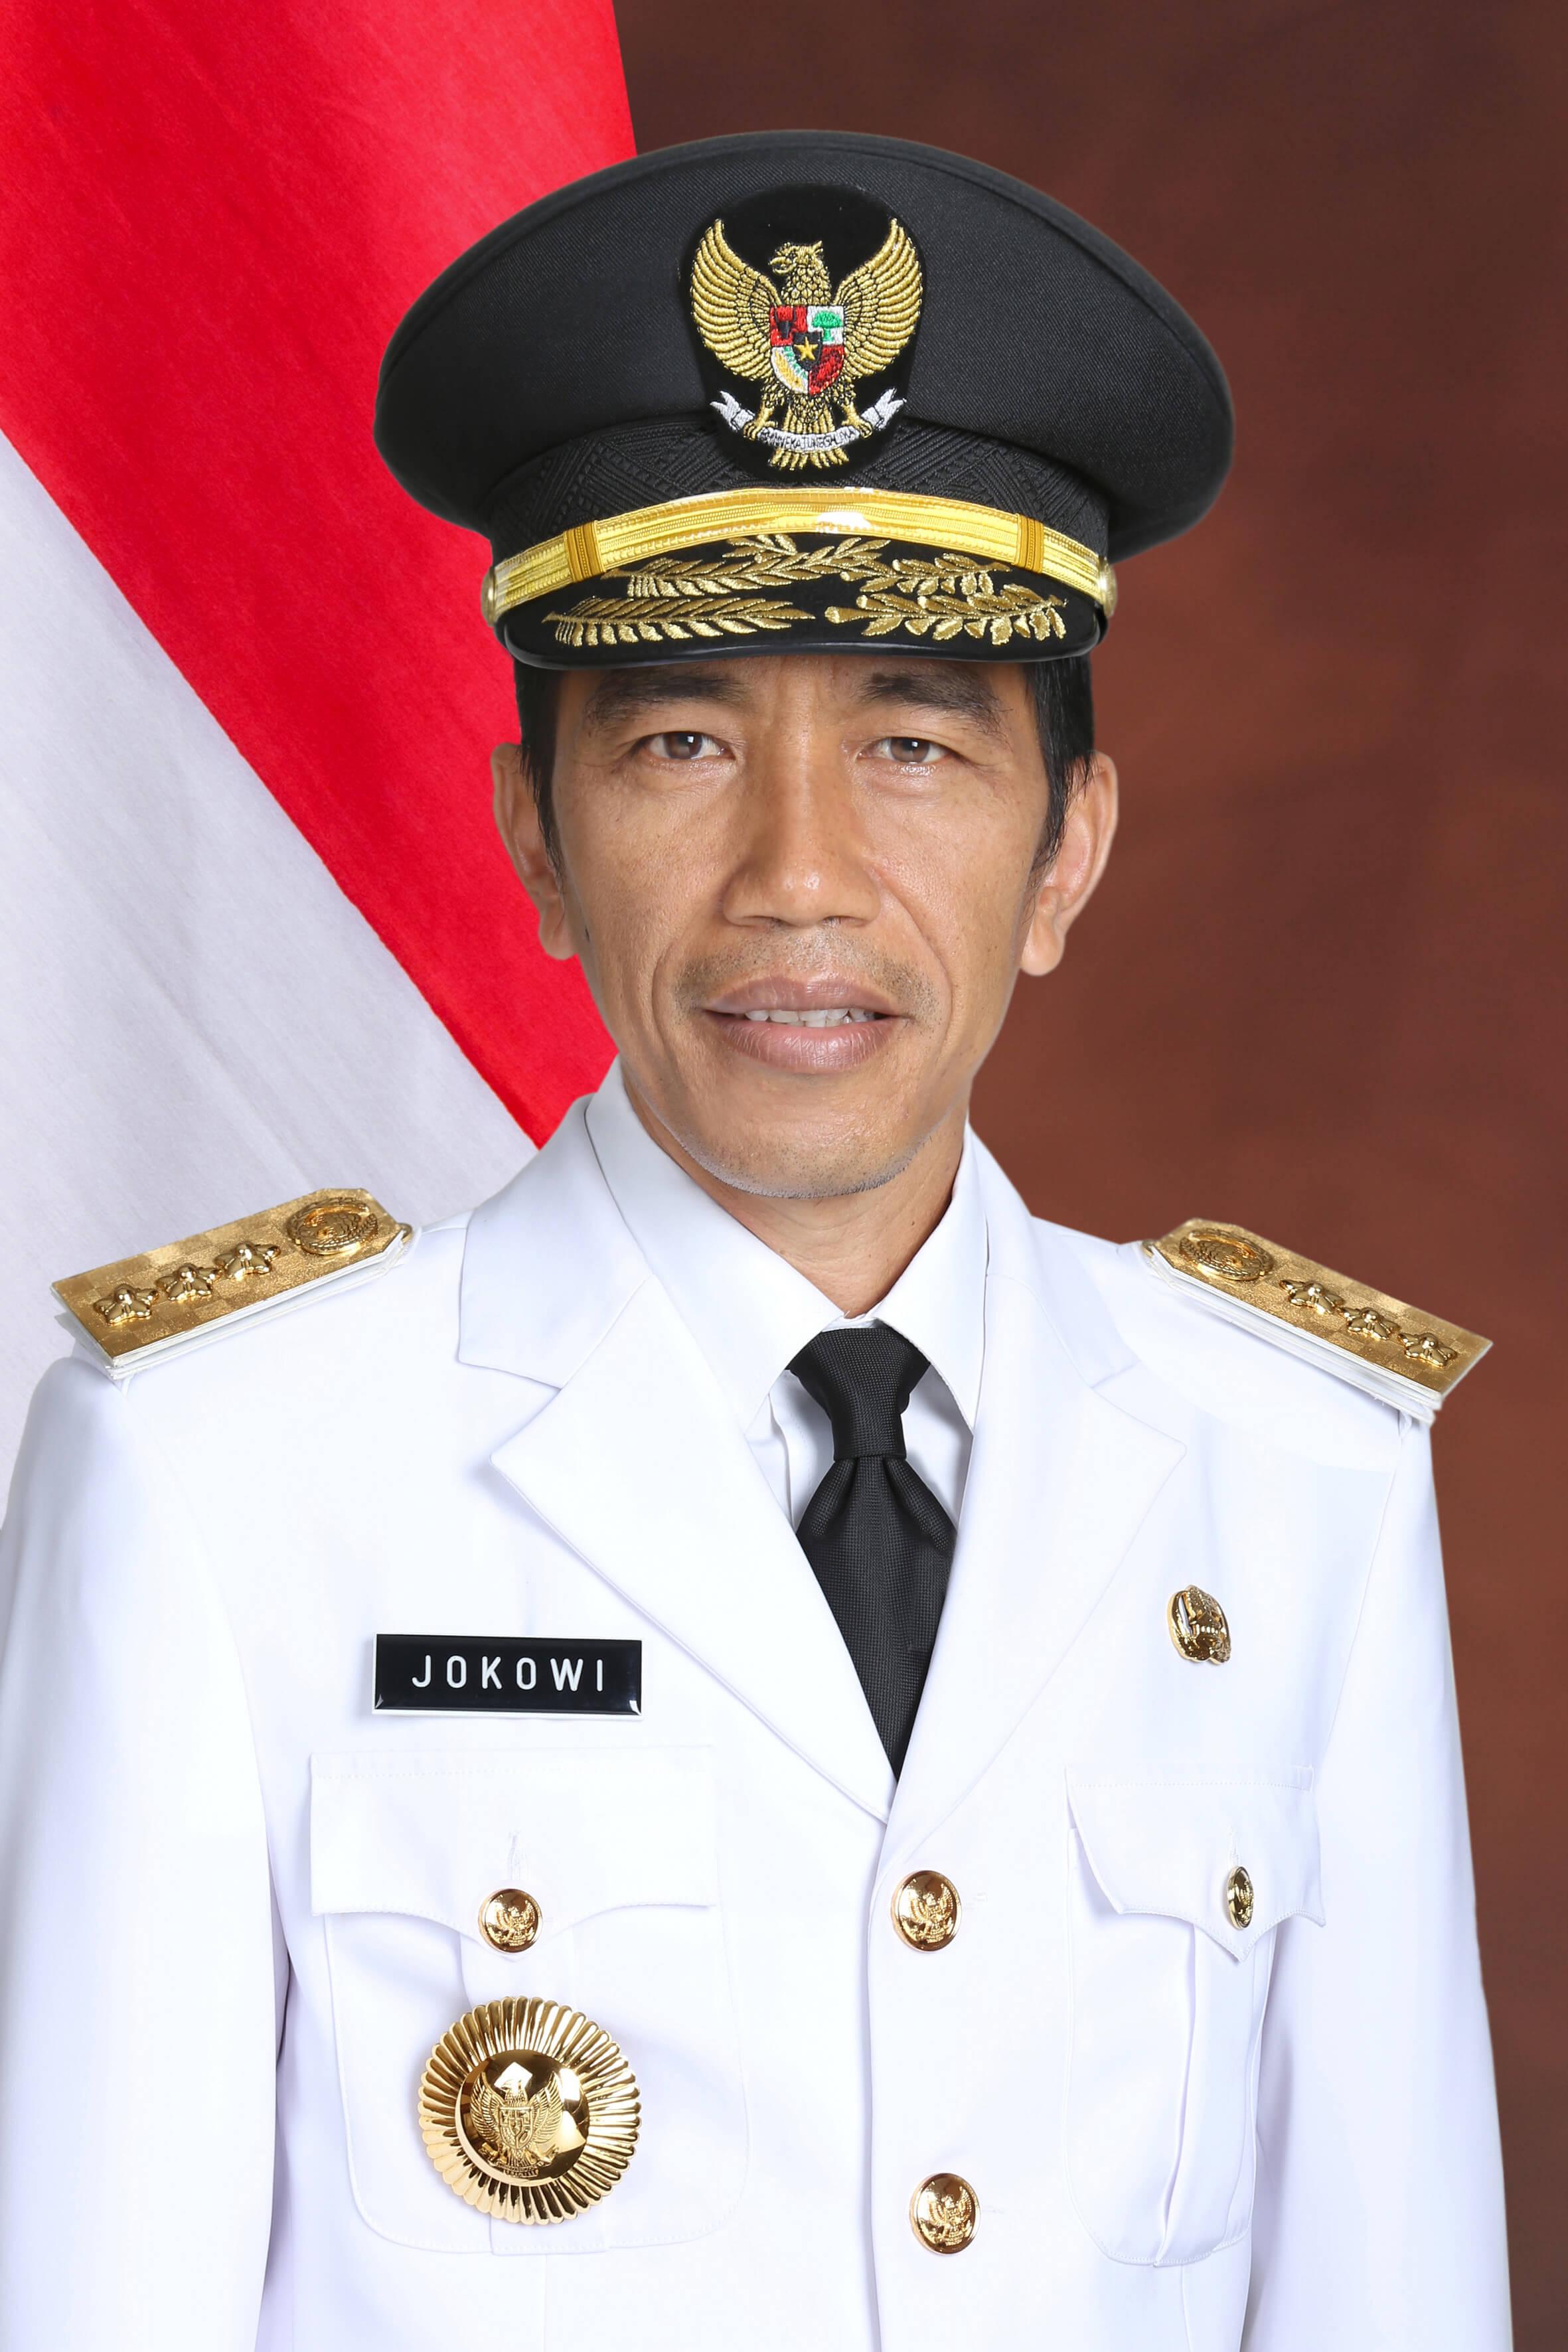 Karier Joko Widodo Sebagai Gubernur Dki Jakarta Wikipedia Bahasa Indonesia Ensiklopedia Bebas